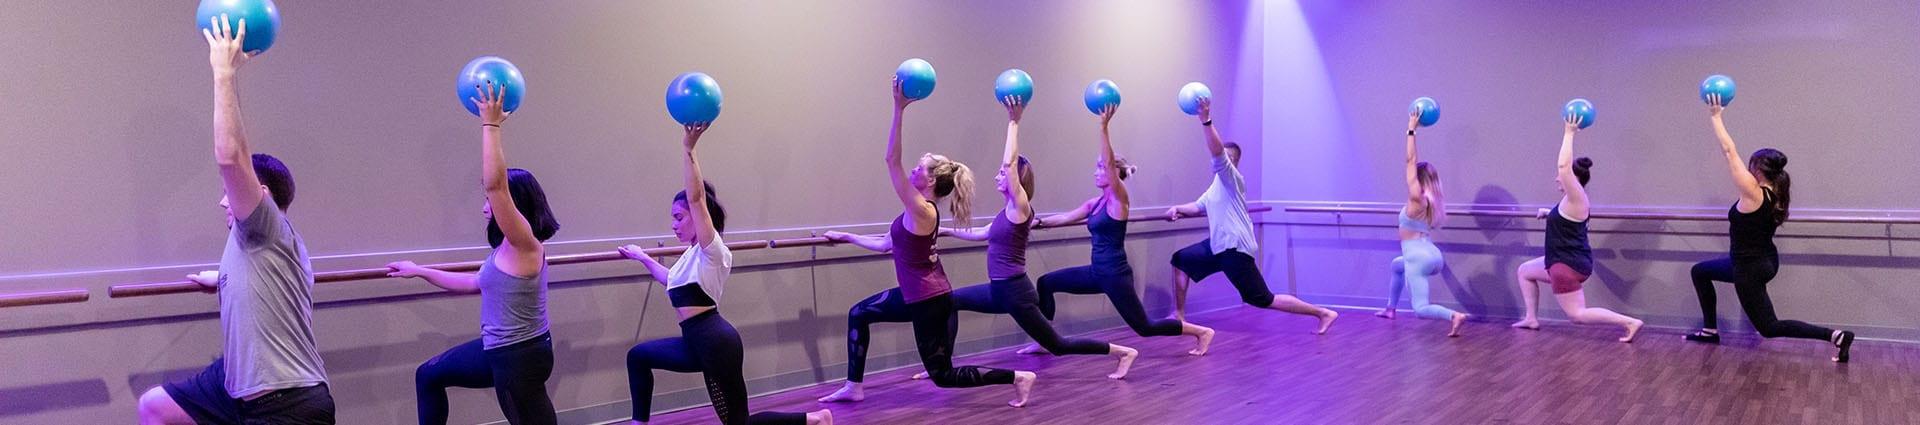 barre class in modern fitness studio